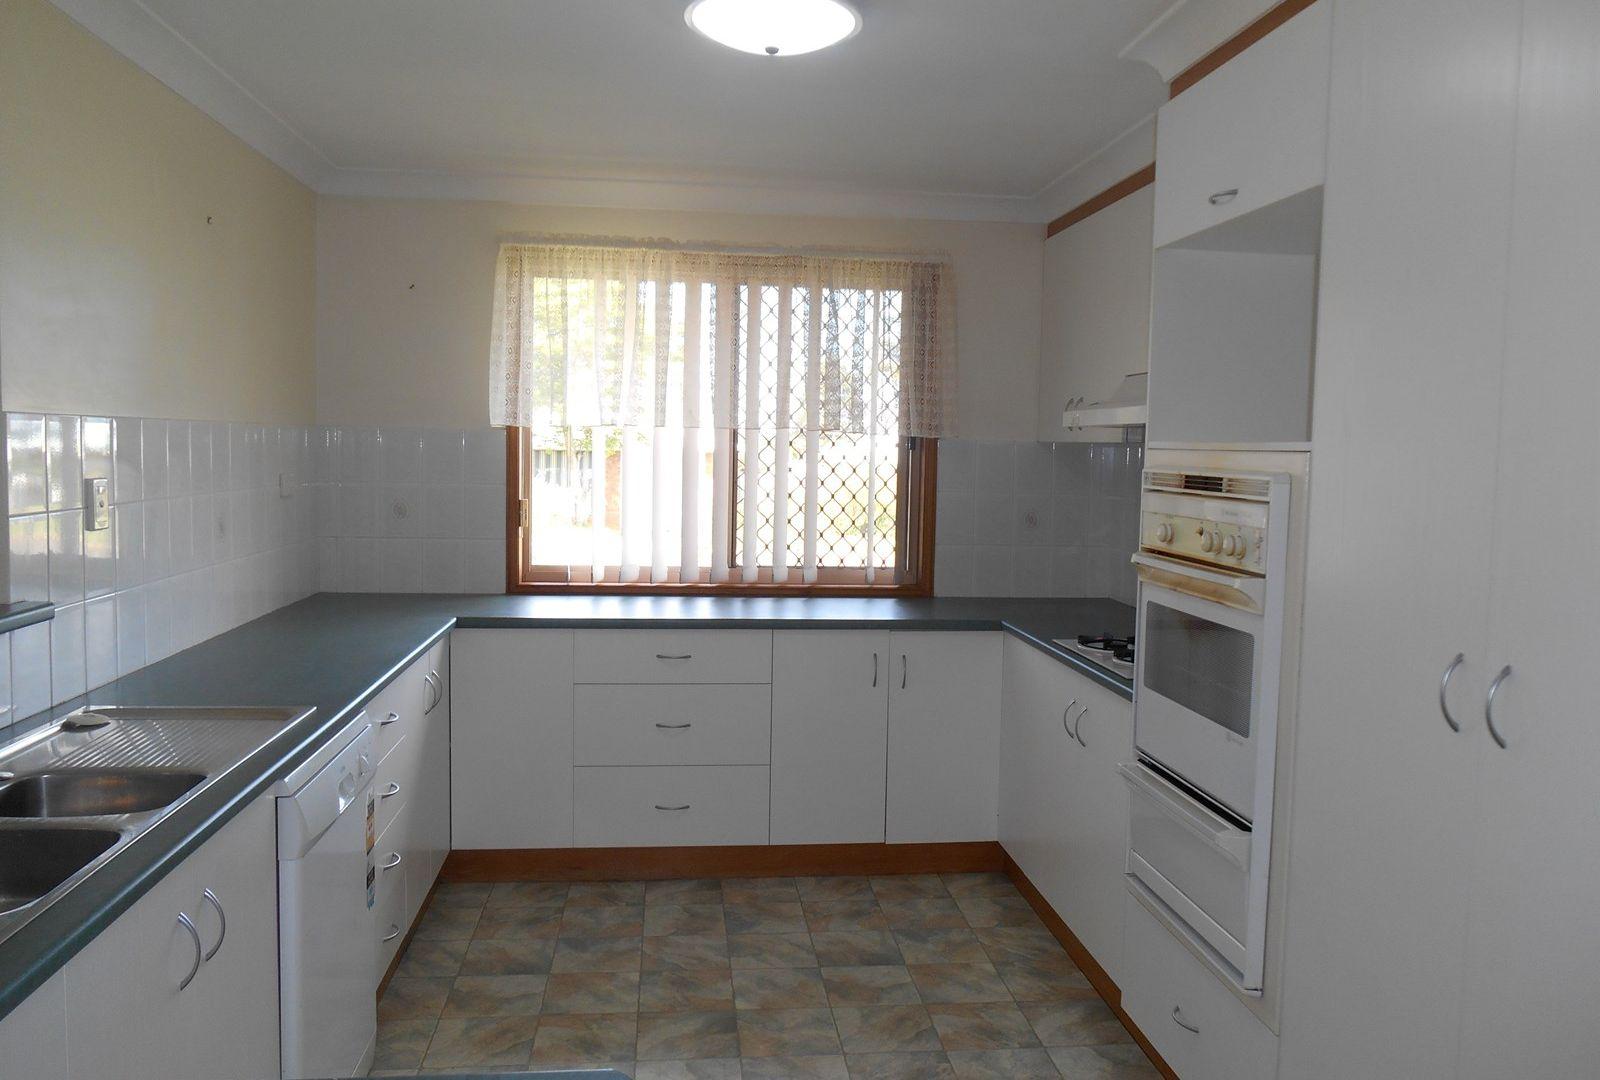 25 Liebke Crescent, Cranley QLD 4350, Image 1